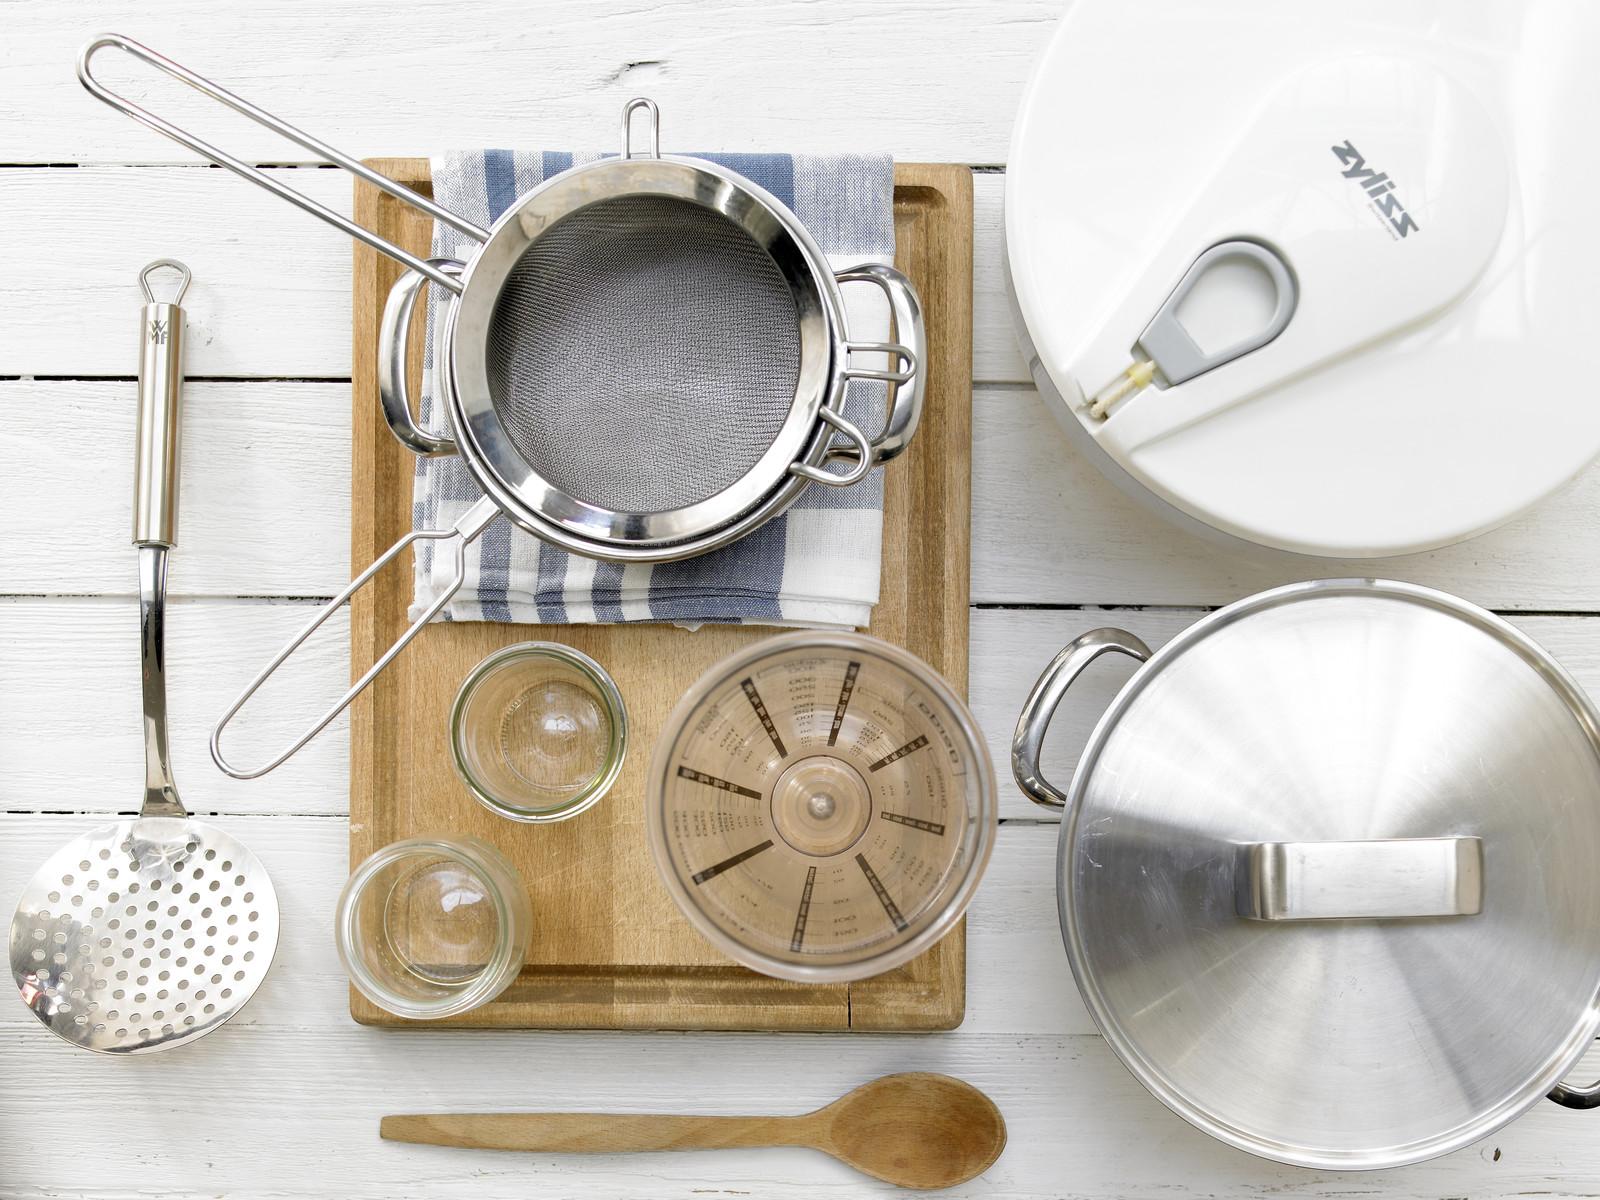 1 topf mit deckel 1 topf 1 messbecher 1 arbeitsbrett 1. Black Bedroom Furniture Sets. Home Design Ideas